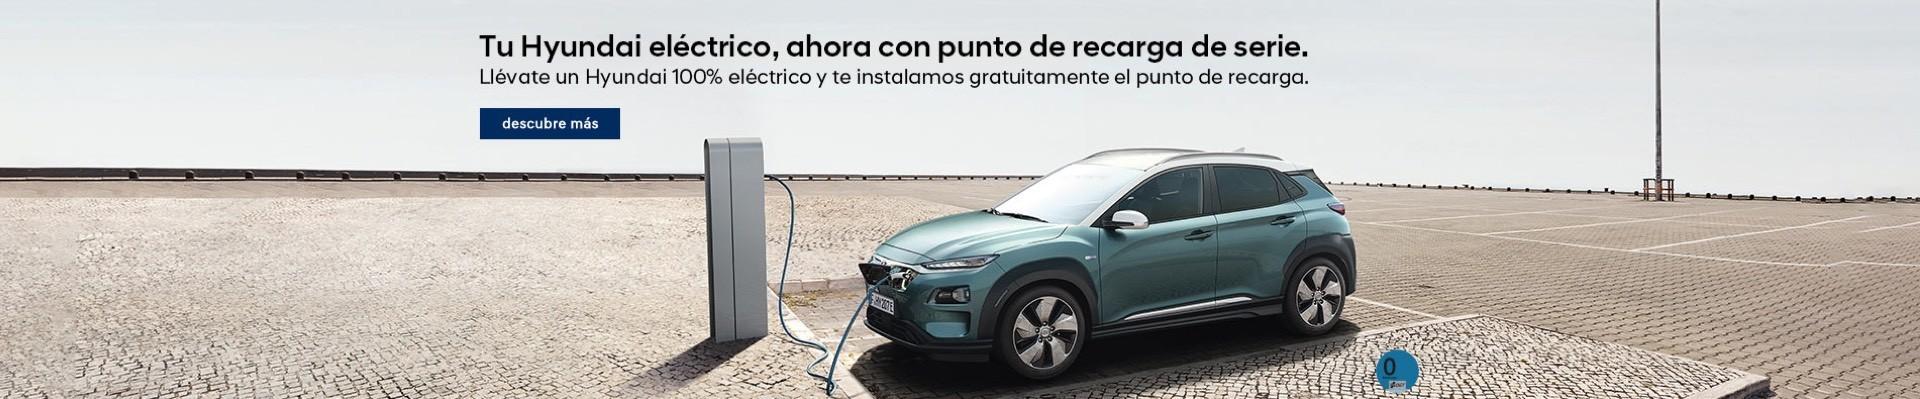 Hyundai Eléctricos